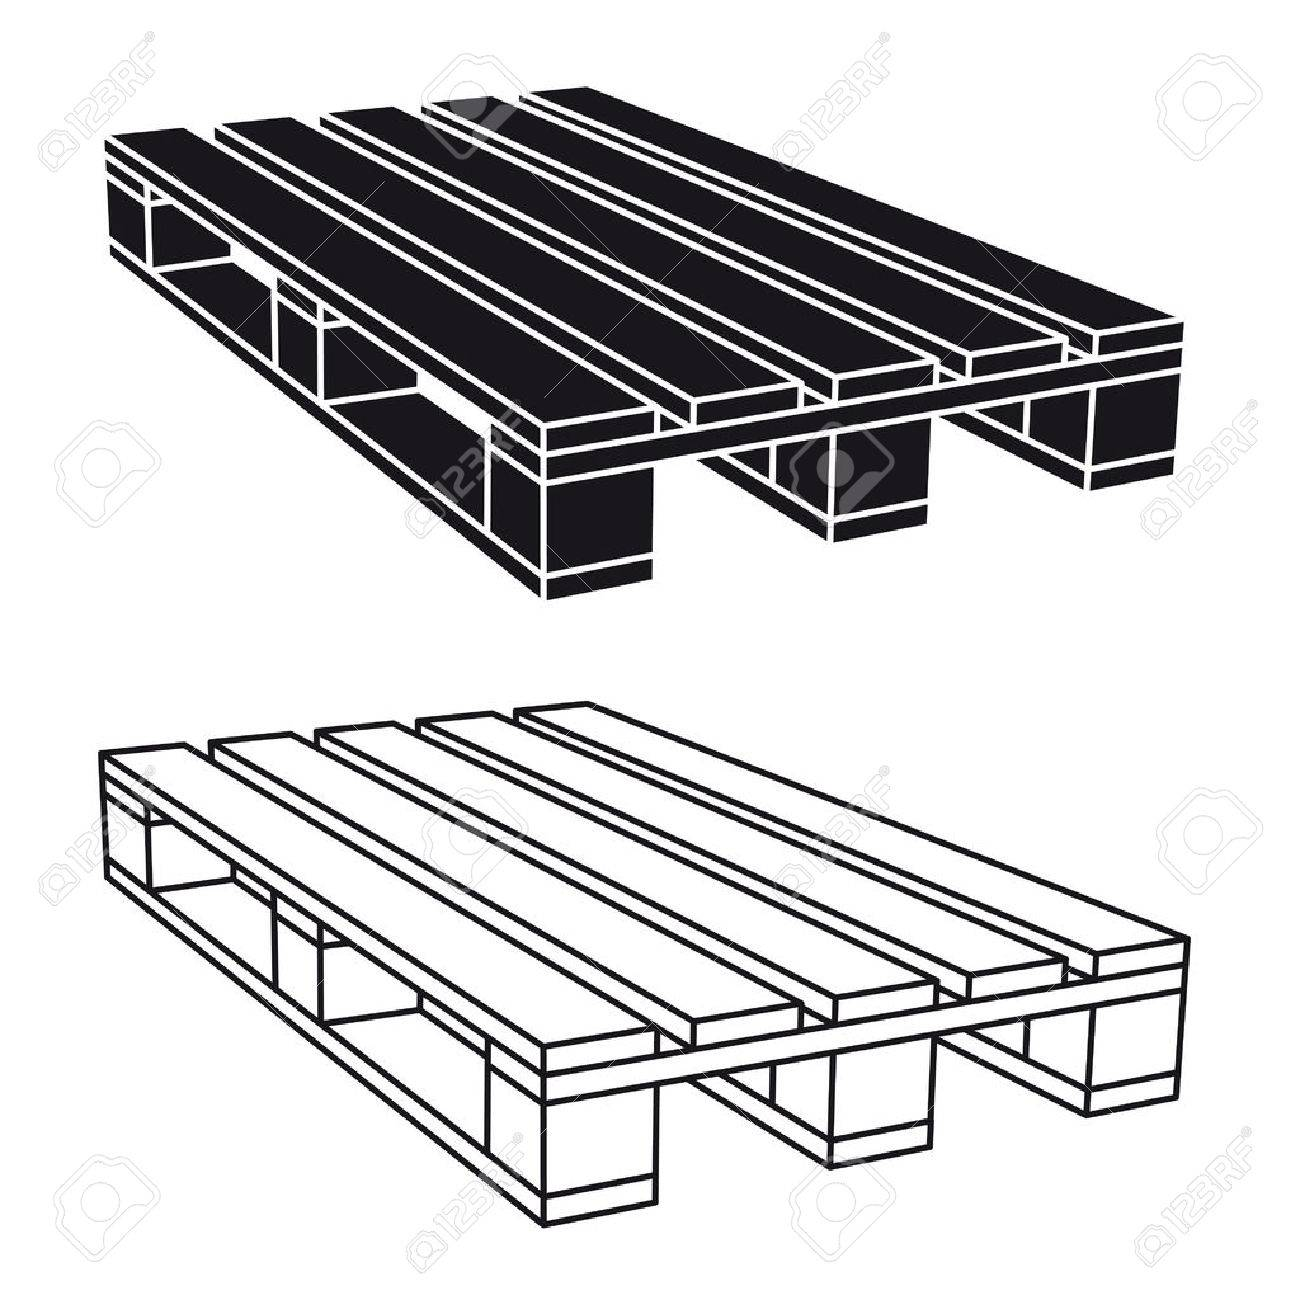 wooden pallet black symbol vector - 69679371